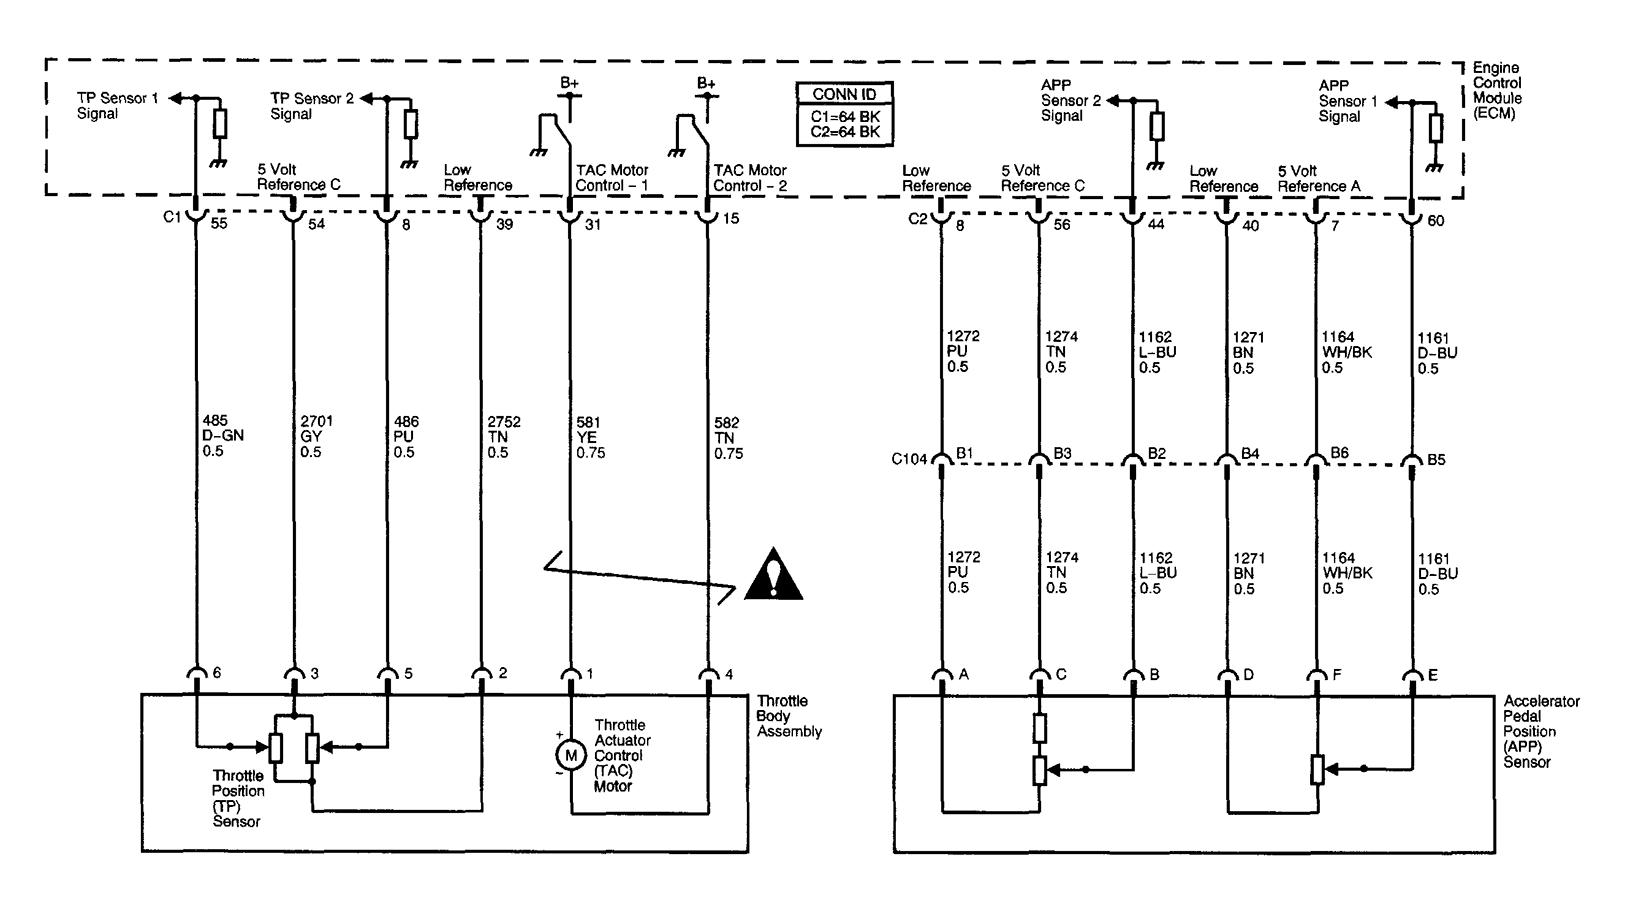 Diagram 2010 Cadillac Srx Wiring Diagram Full Version Hd Quality Wiring Diagram Wiringenclosure Drivefermierlyonnais Fr